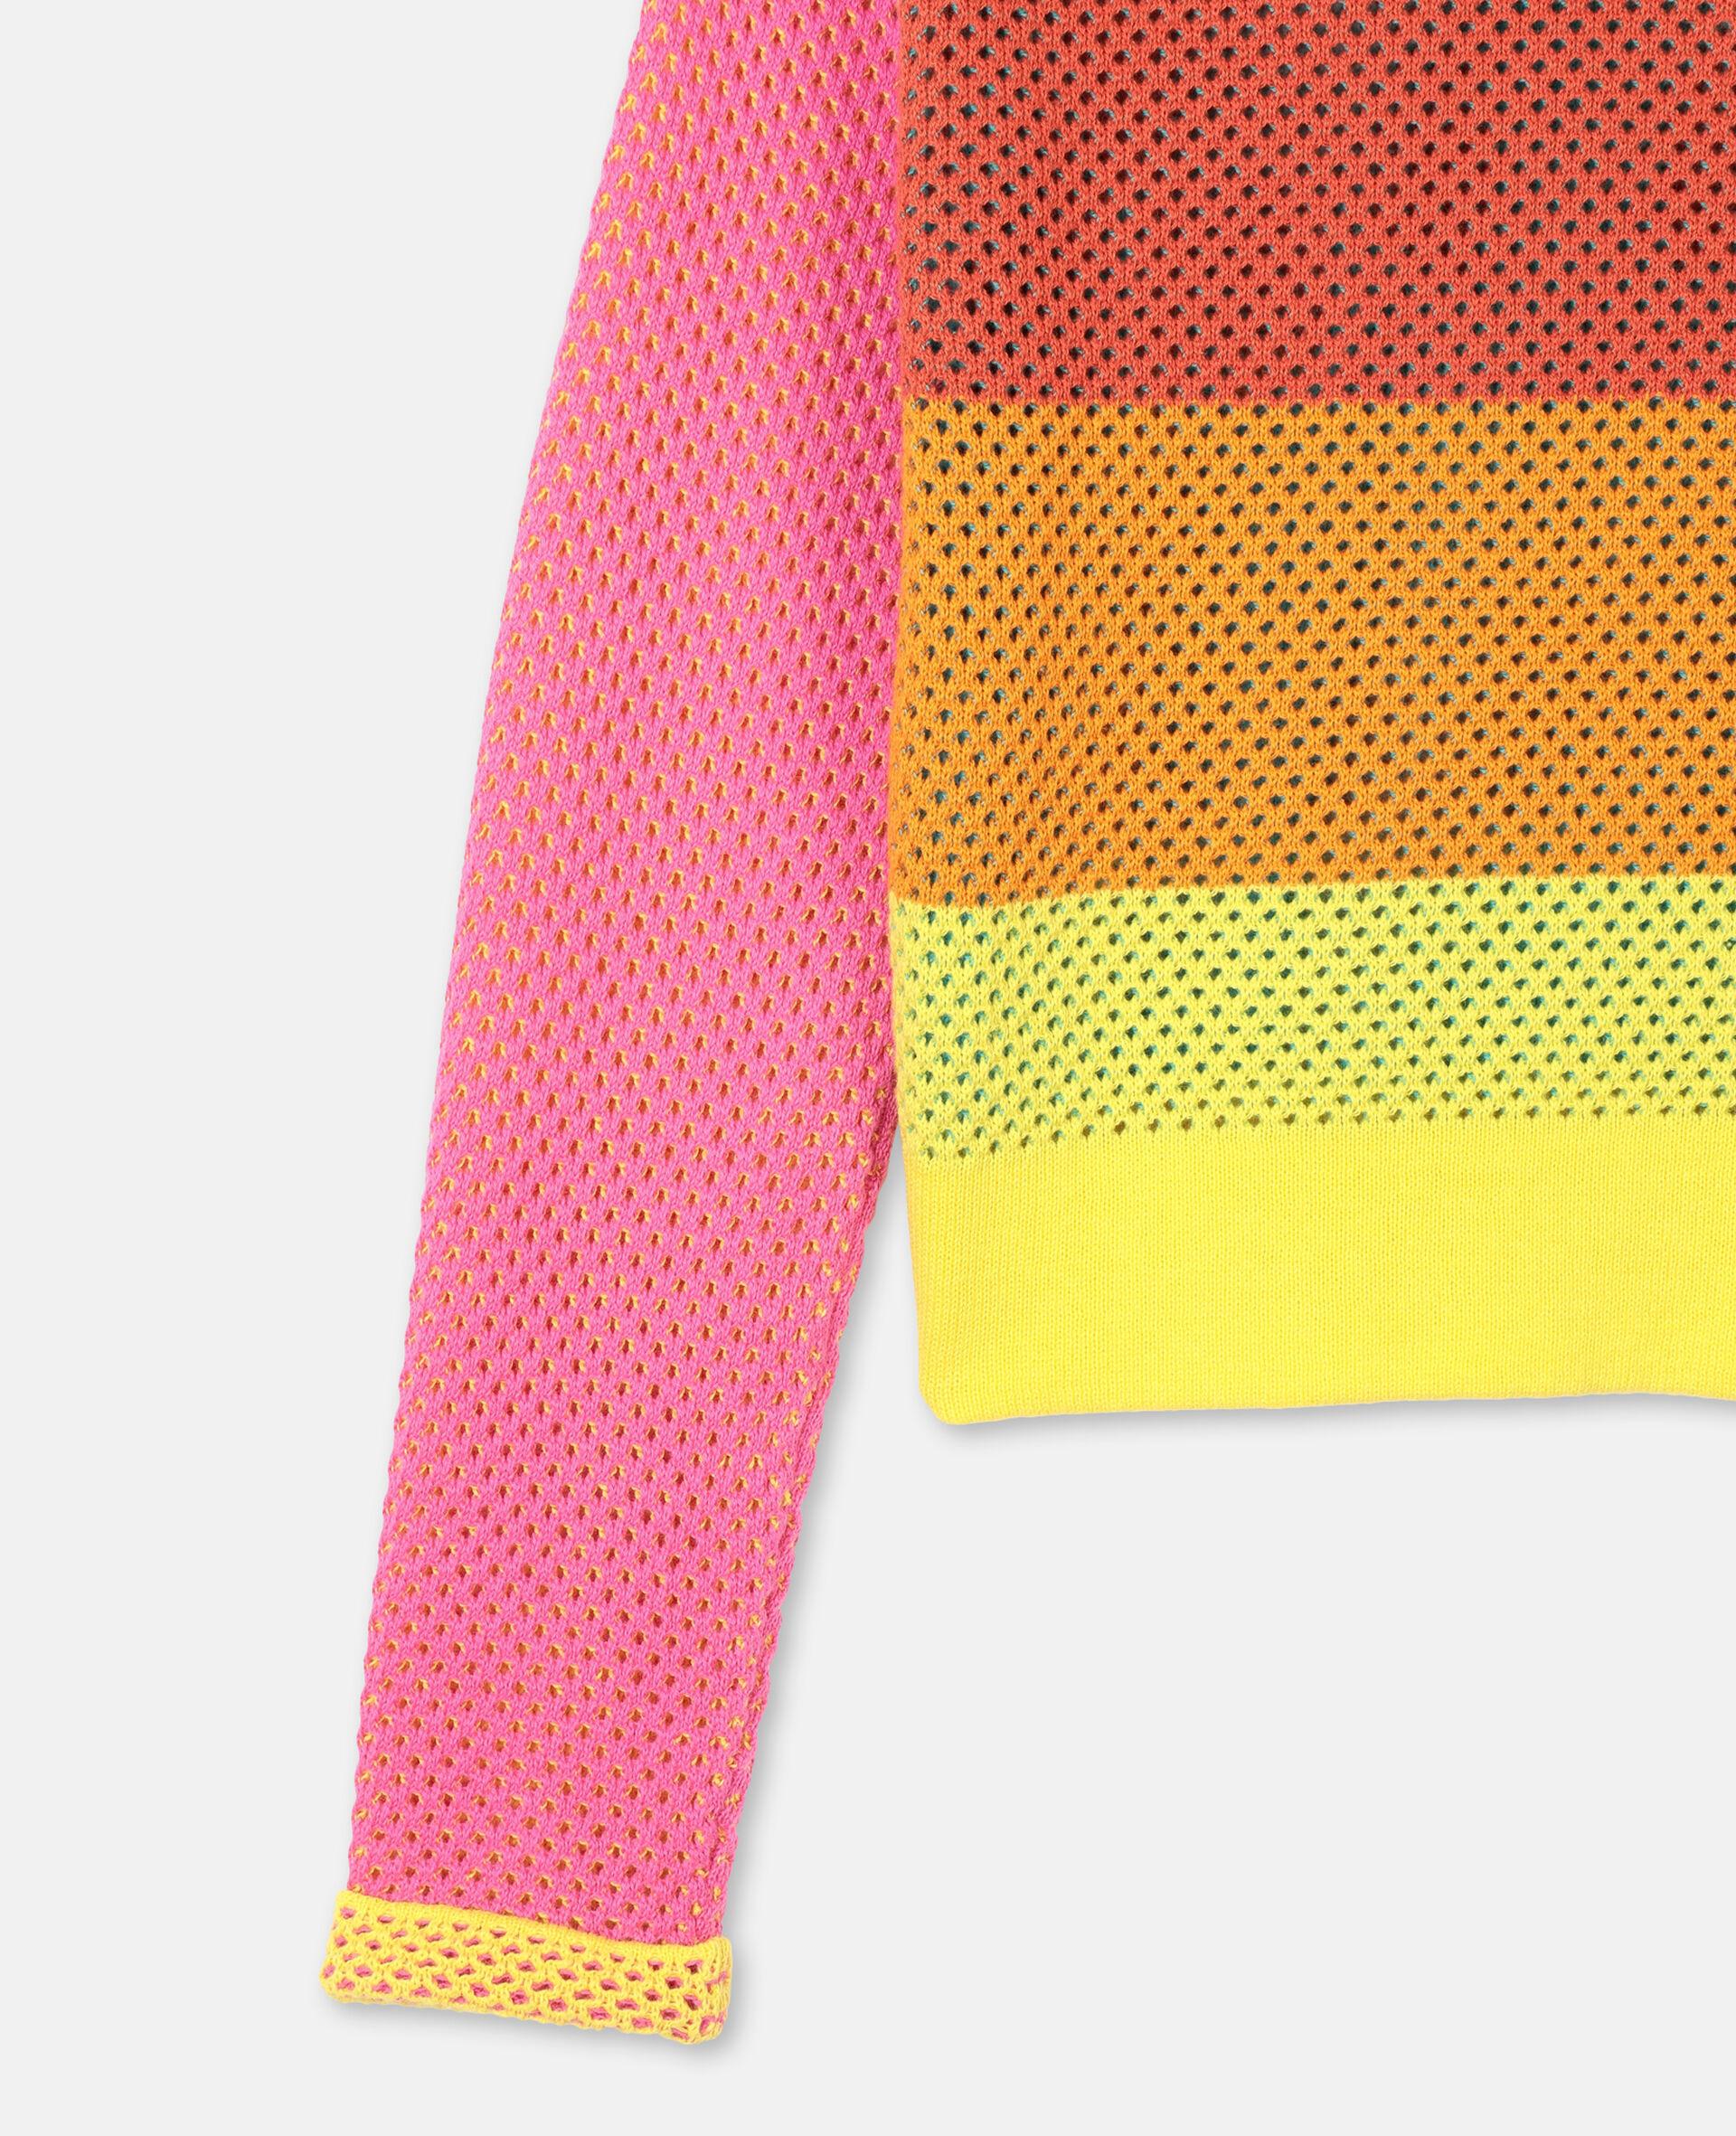 Intarsia Mesh Knit Cotton Jumper -Multicolour-large image number 2